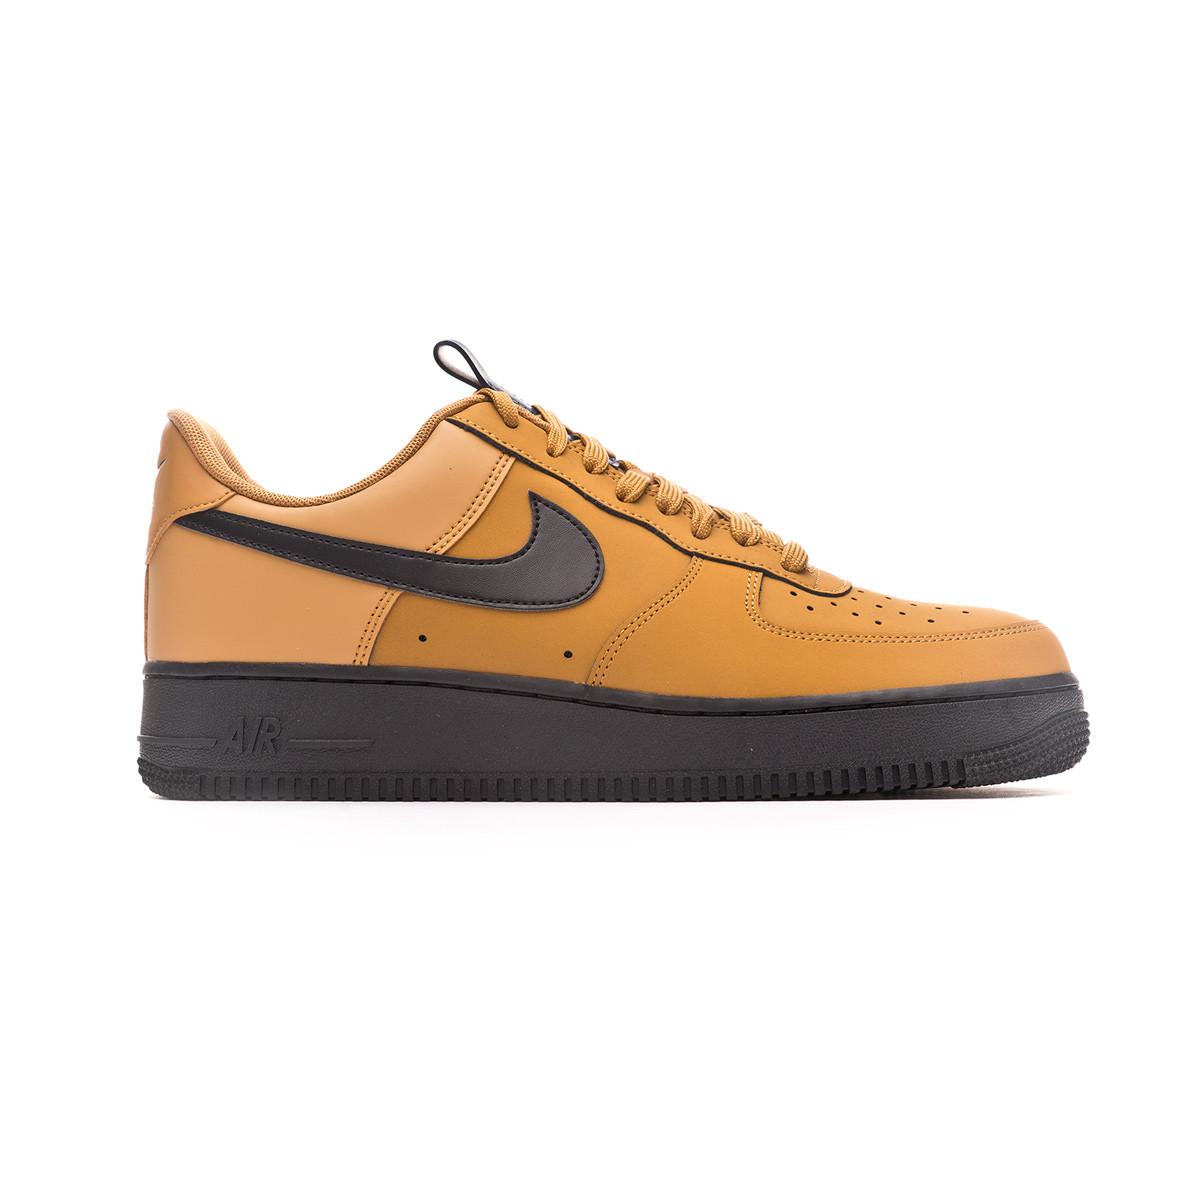 Nike Air Force 1 '07 WheatBlack Midnight Navy BQ4326 700